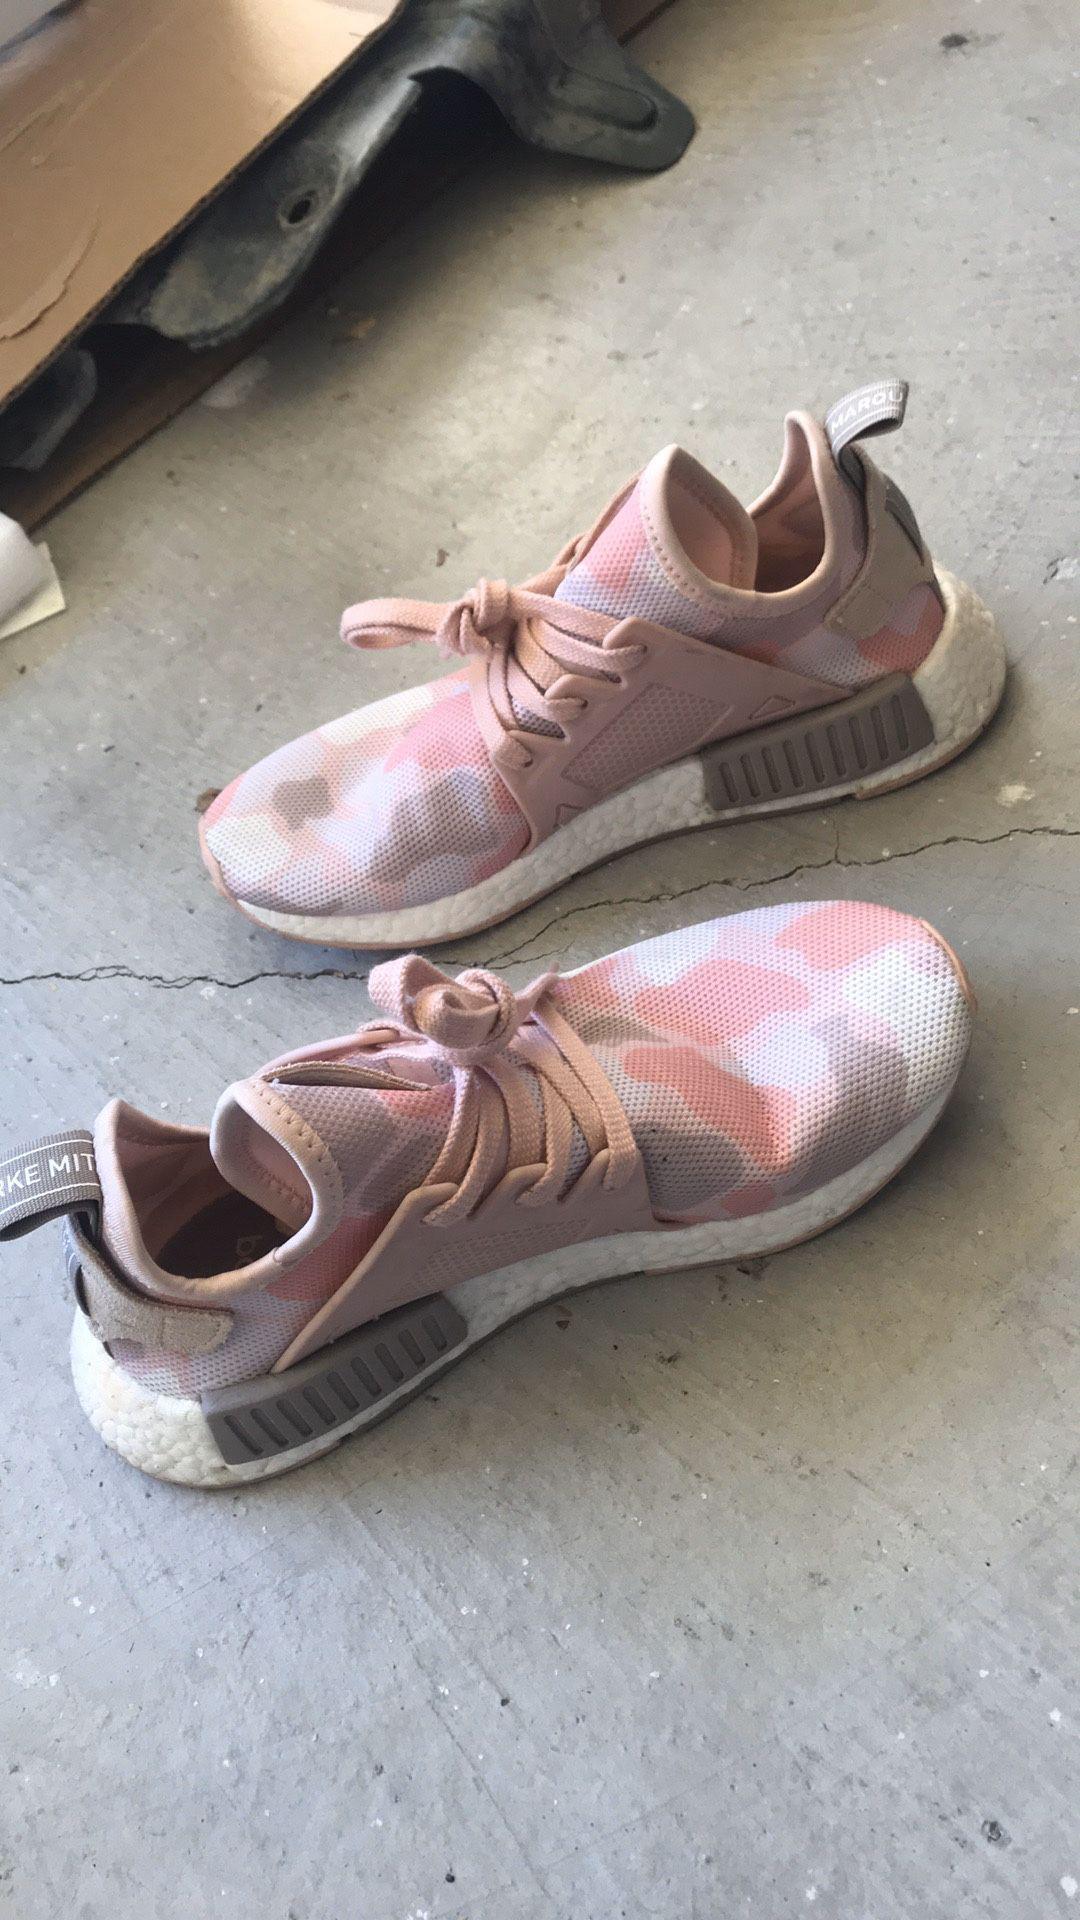 RARE Adidas NMD RX1 Pink Duck Camo